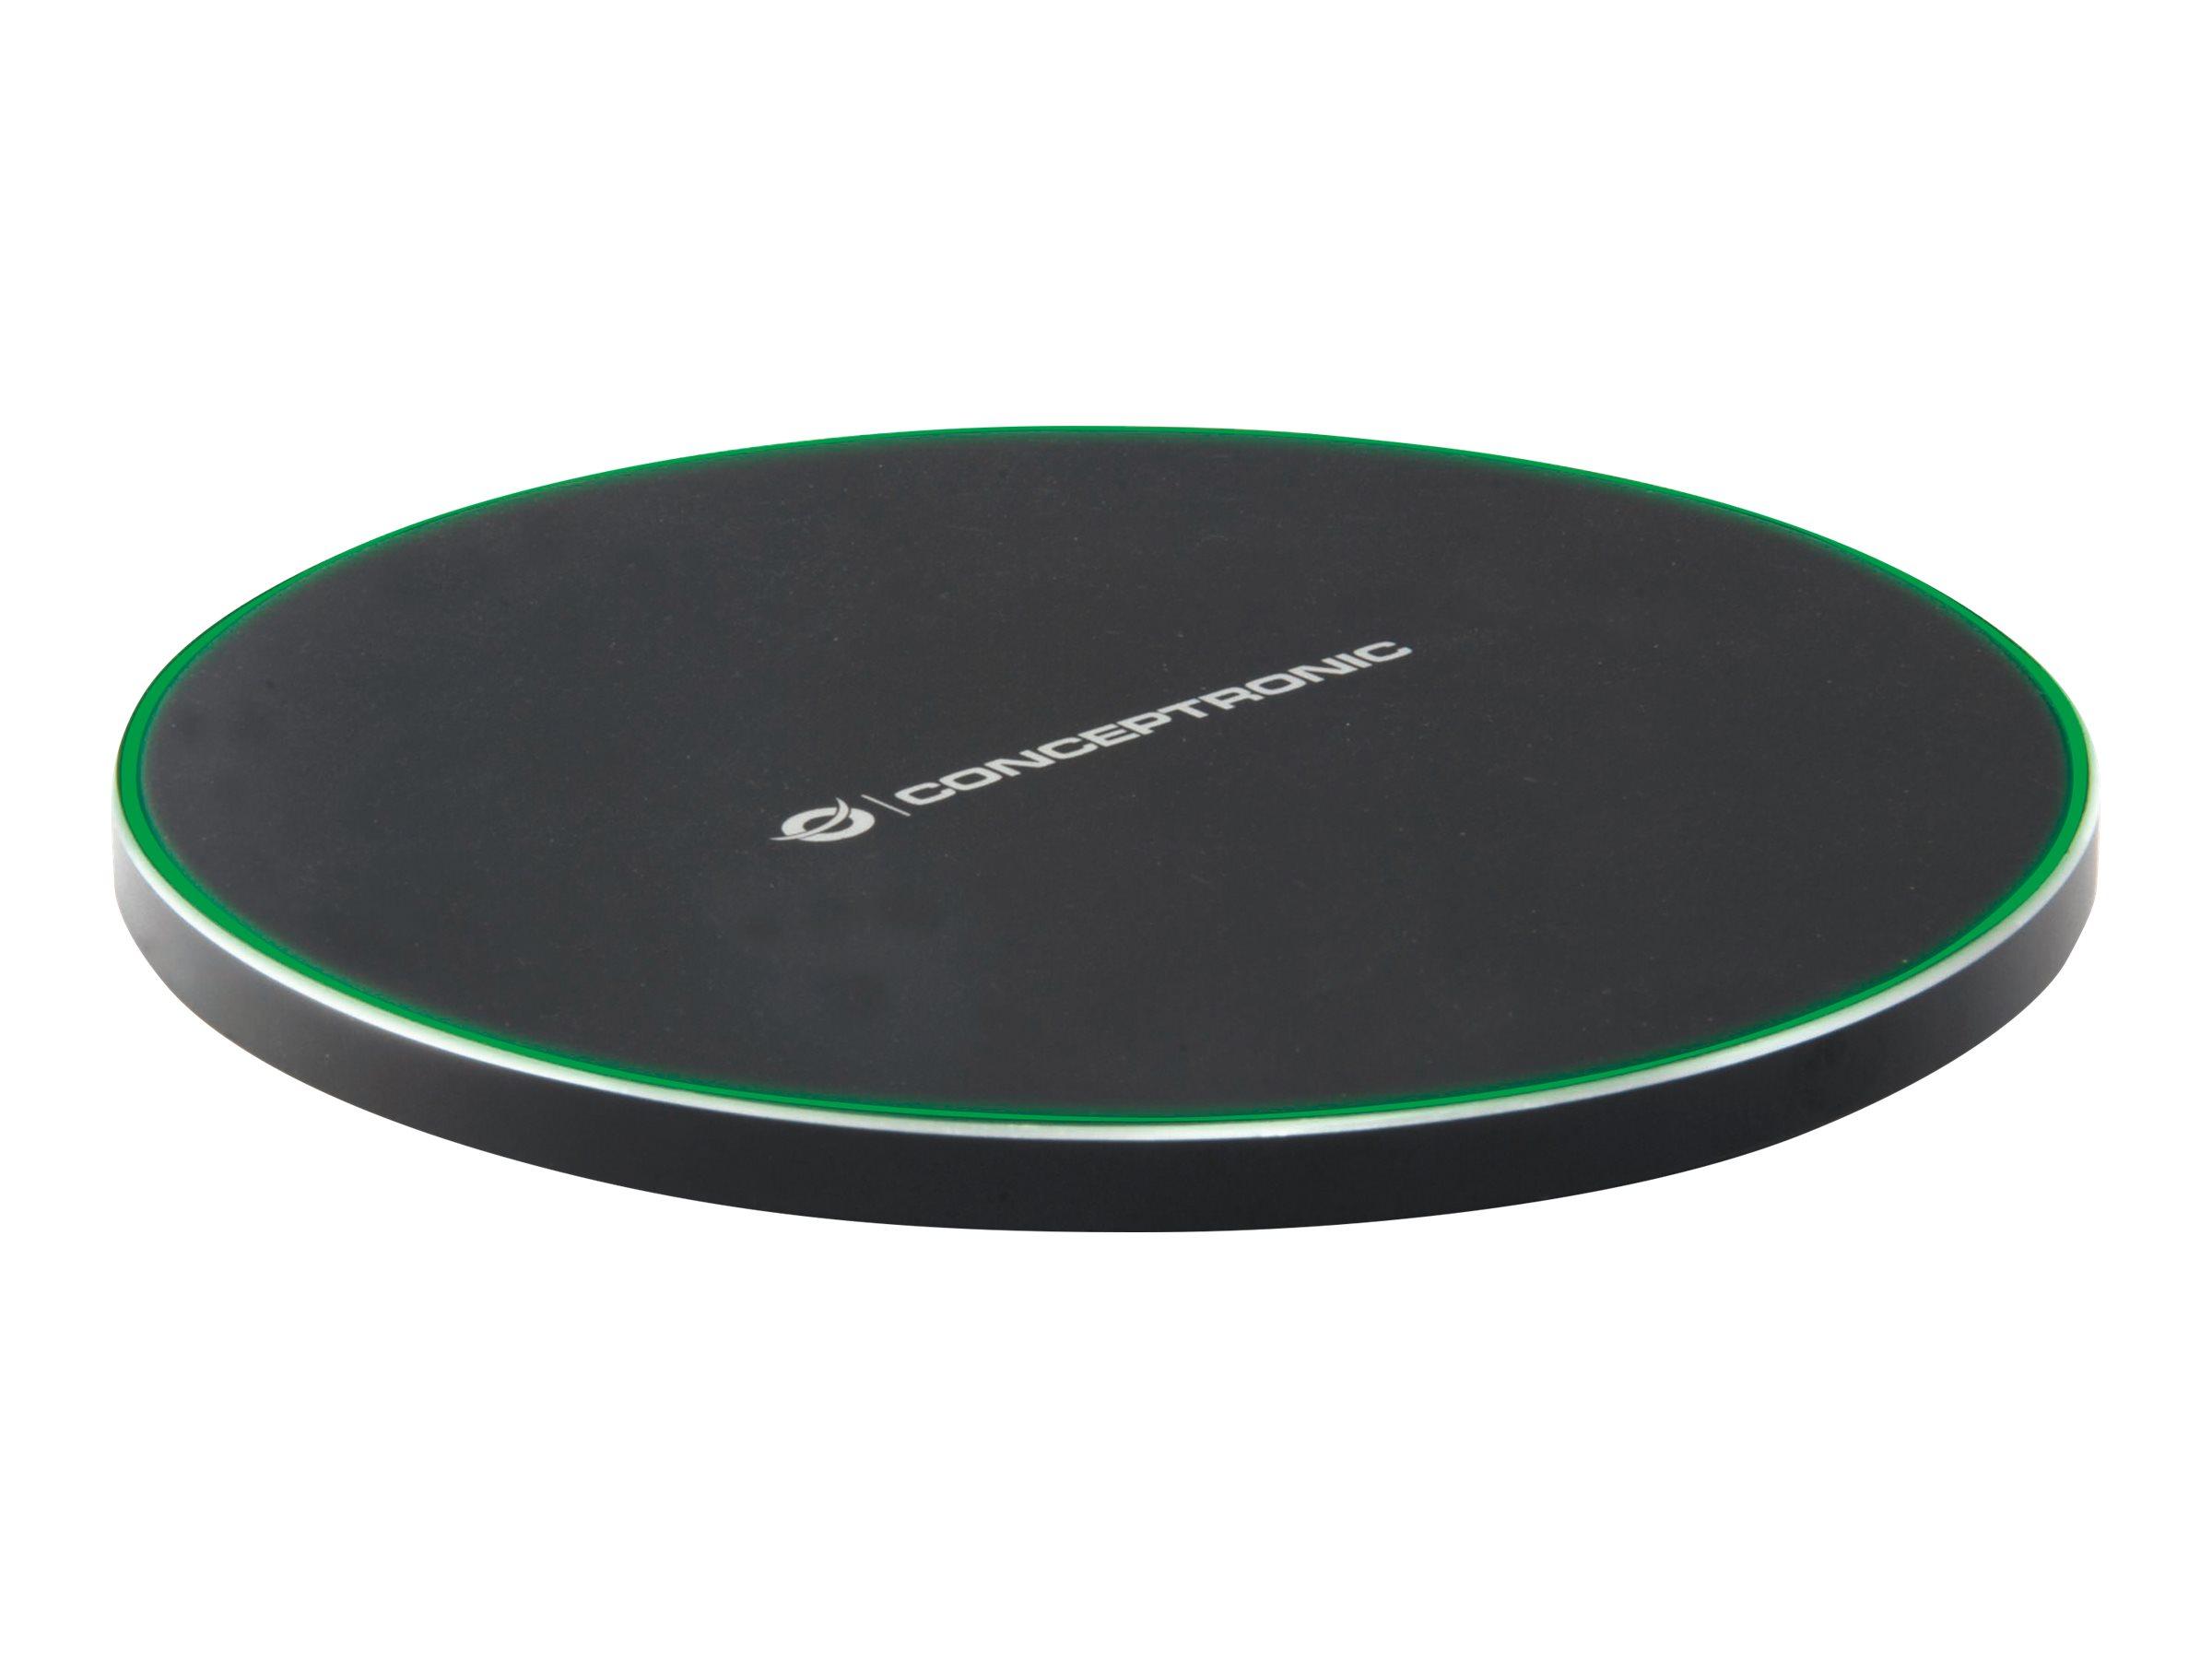 Conceptronic GORGON01B GORGON Wireless Charger